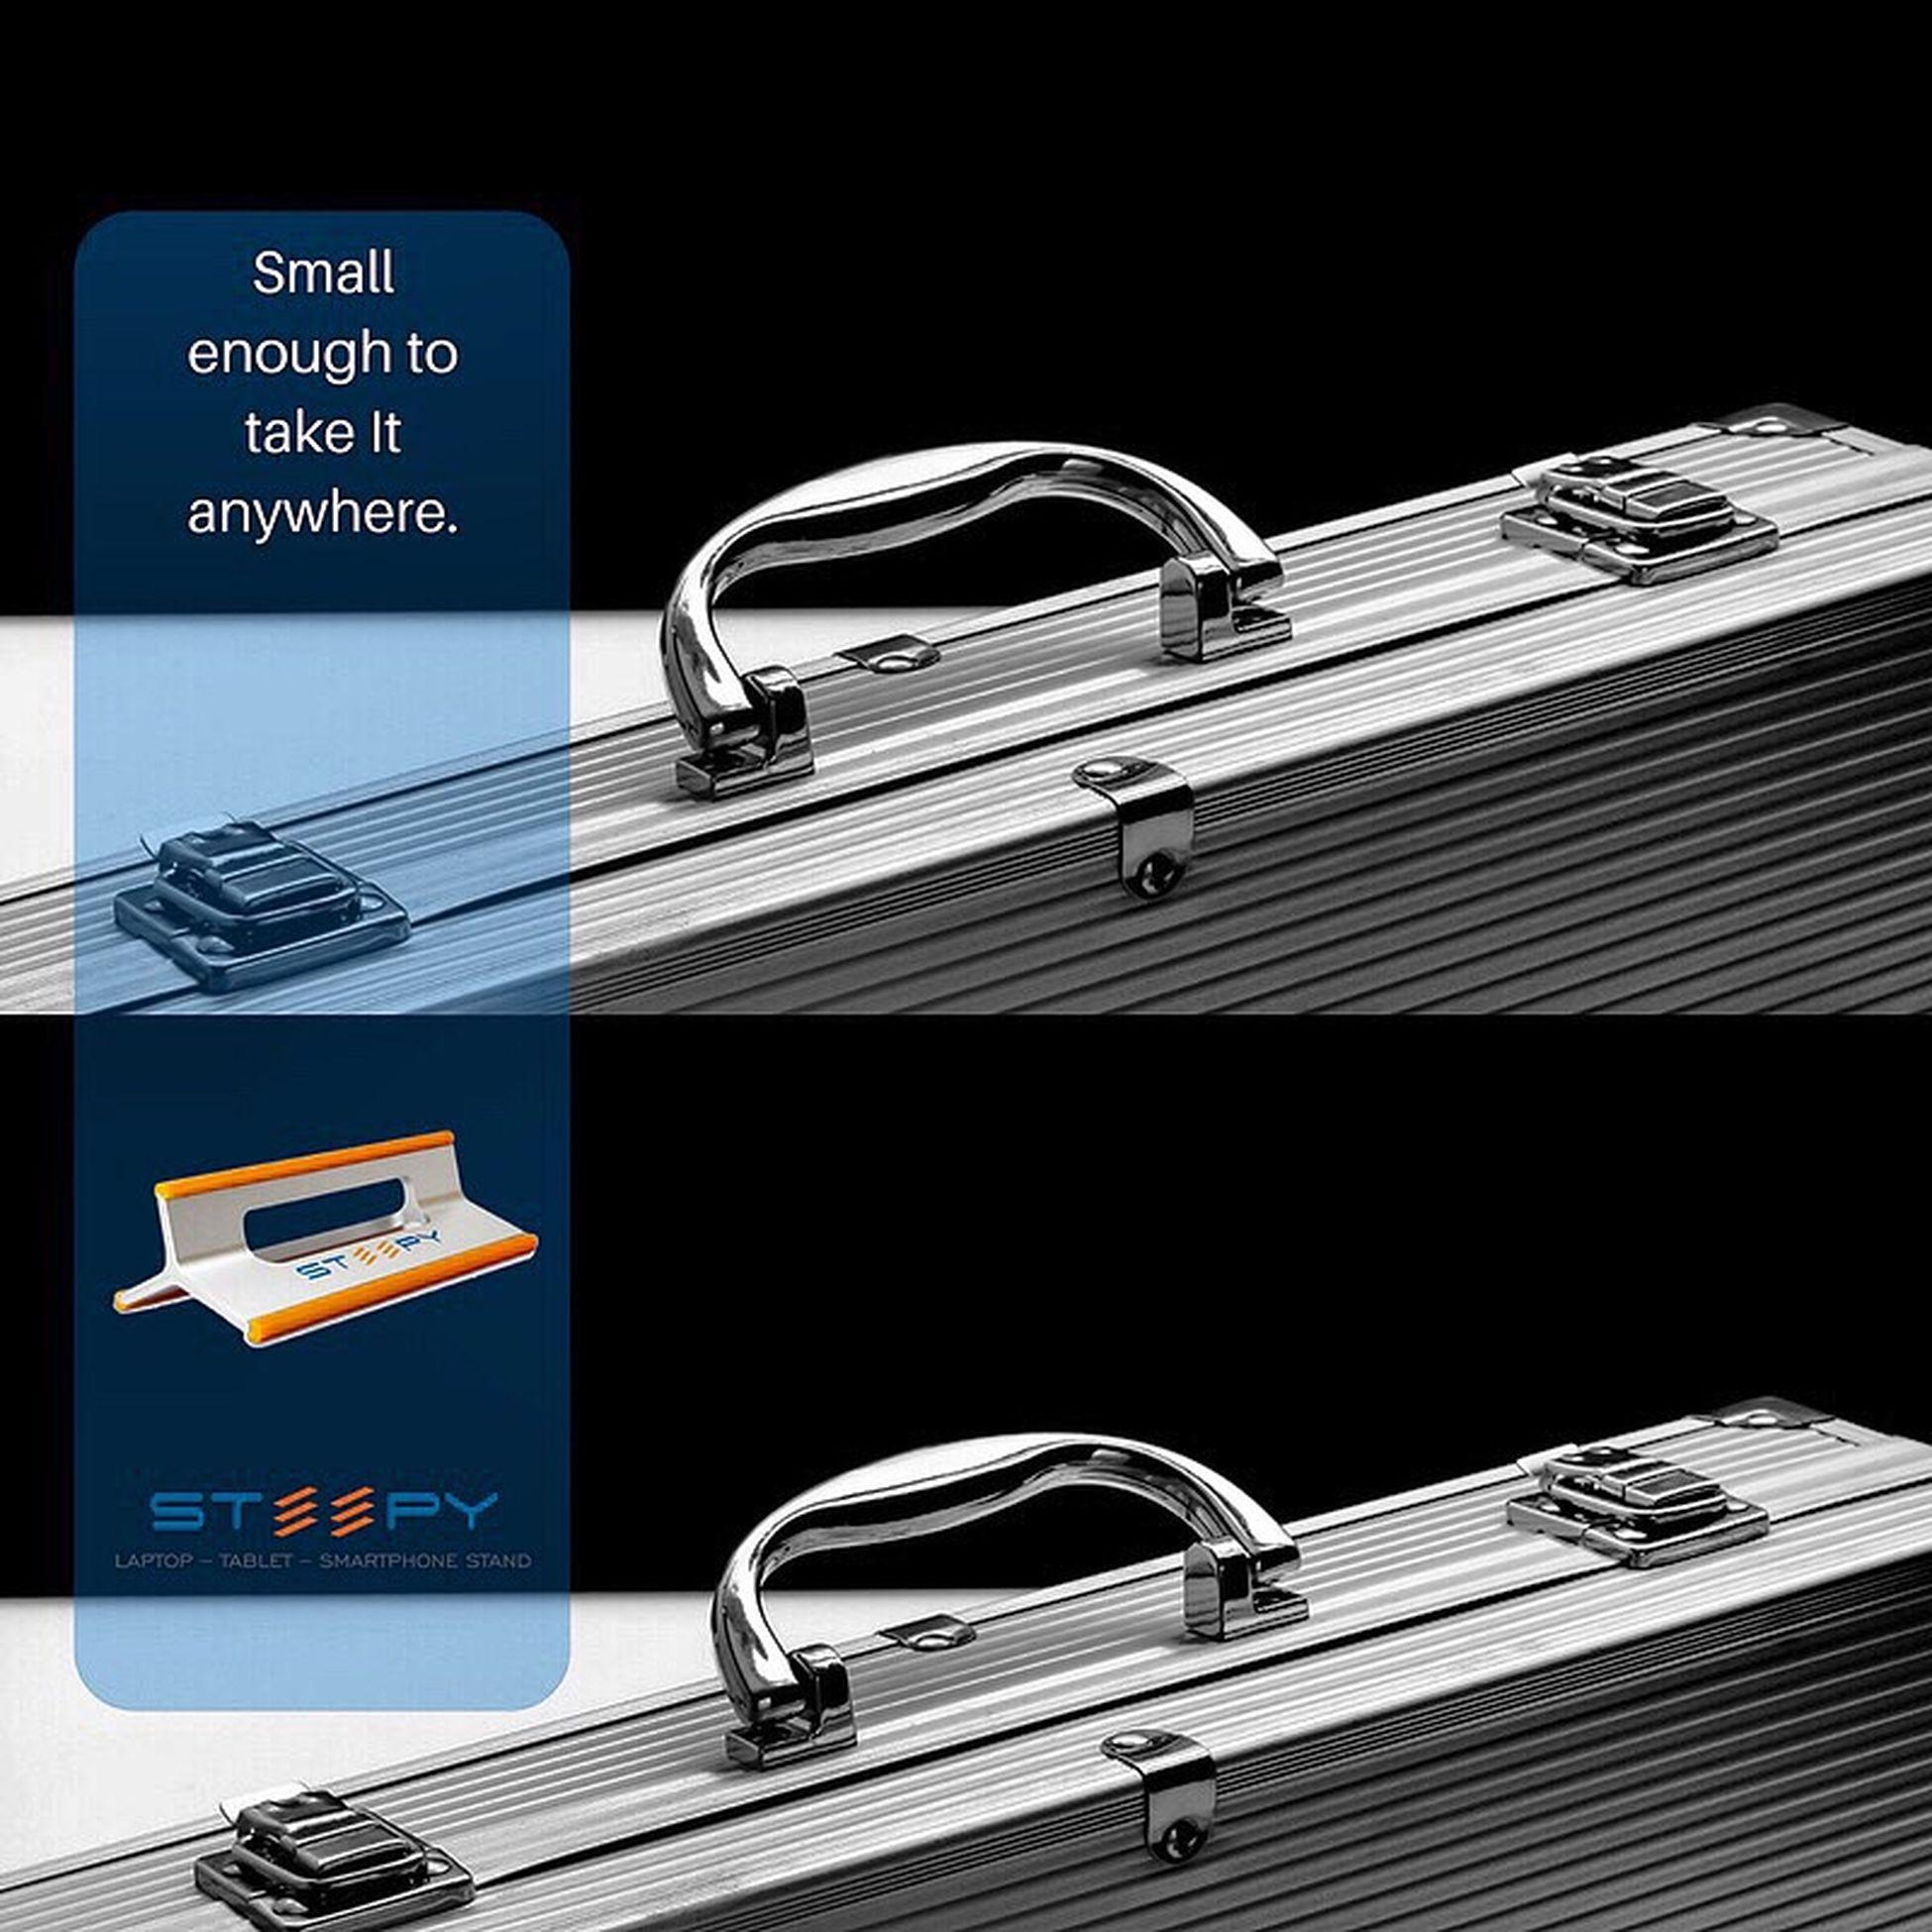 Small enough to take it anywhere. www.steepy.net Work Ergonomic Technology Gadgets Laptop Laptop Work Millenials Working Hard Remotework STEEPY Entrepreneur News Buy